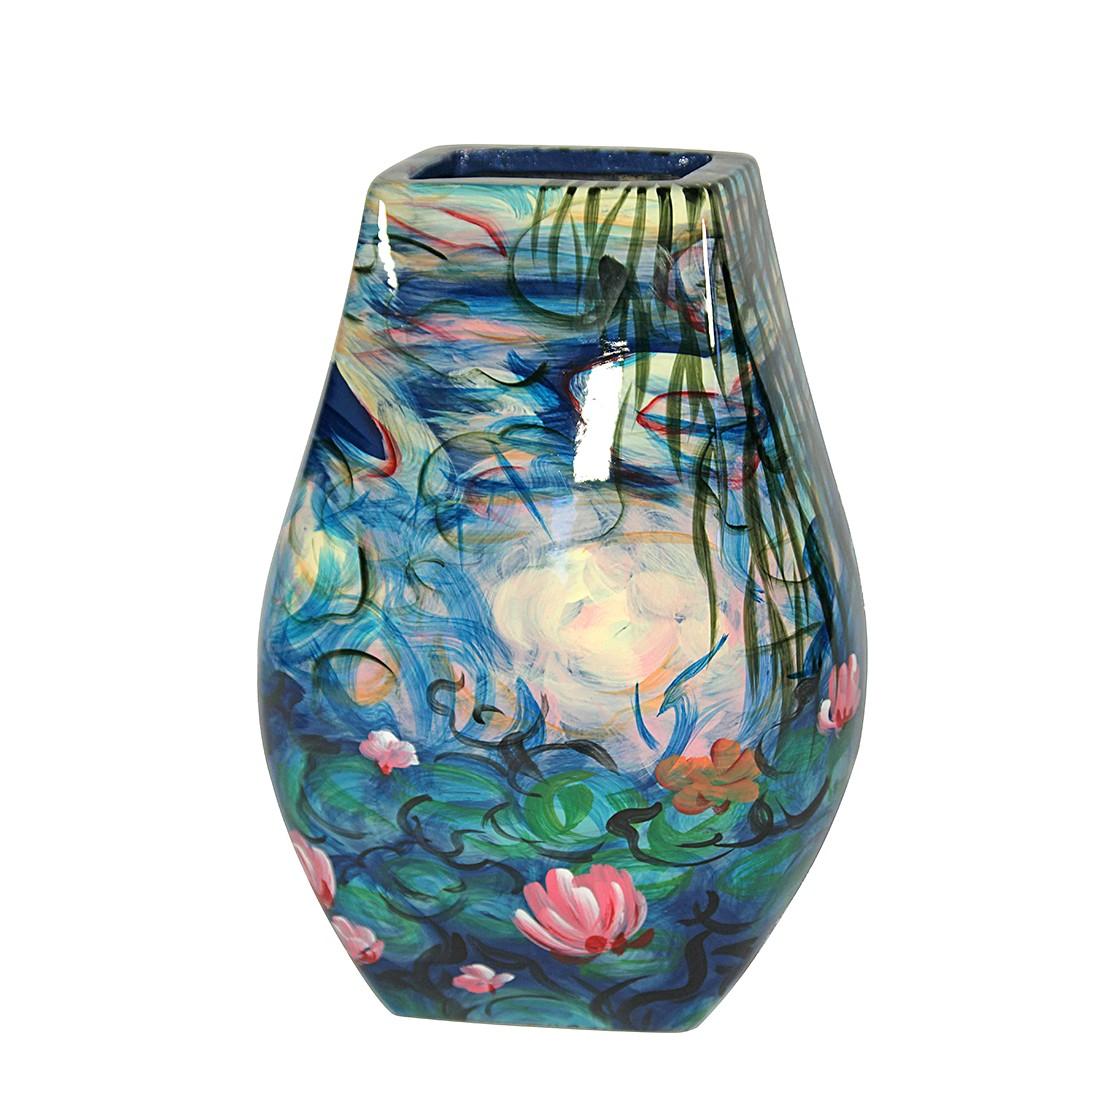 Vase Monet Seerosen III – Porzellan – Handbemalt, Art for living jetzt kaufen